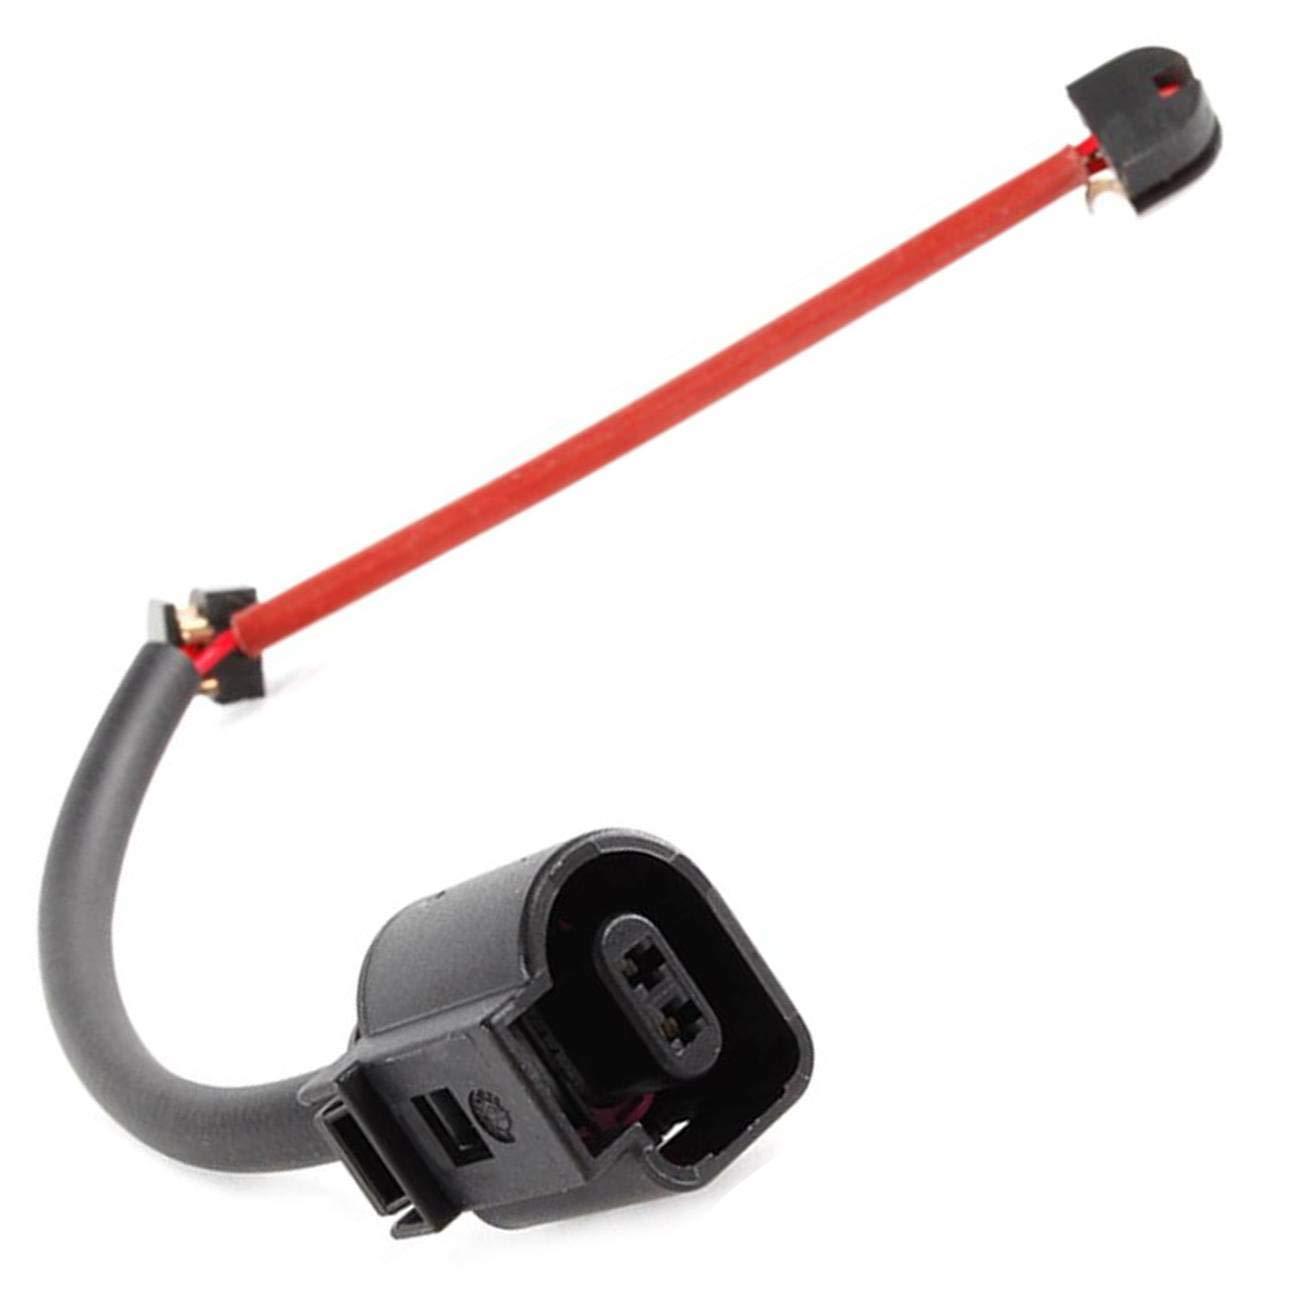 VioletLisa 2pcs Rear Brake Wear Pad Sensor 7L0907637B For 2007-2010 Audi Q7 Sport Utility 2003-2014 Porsche Cayenne Sport Utility 2004-2010 Volkswagen Touareg Sport Utility